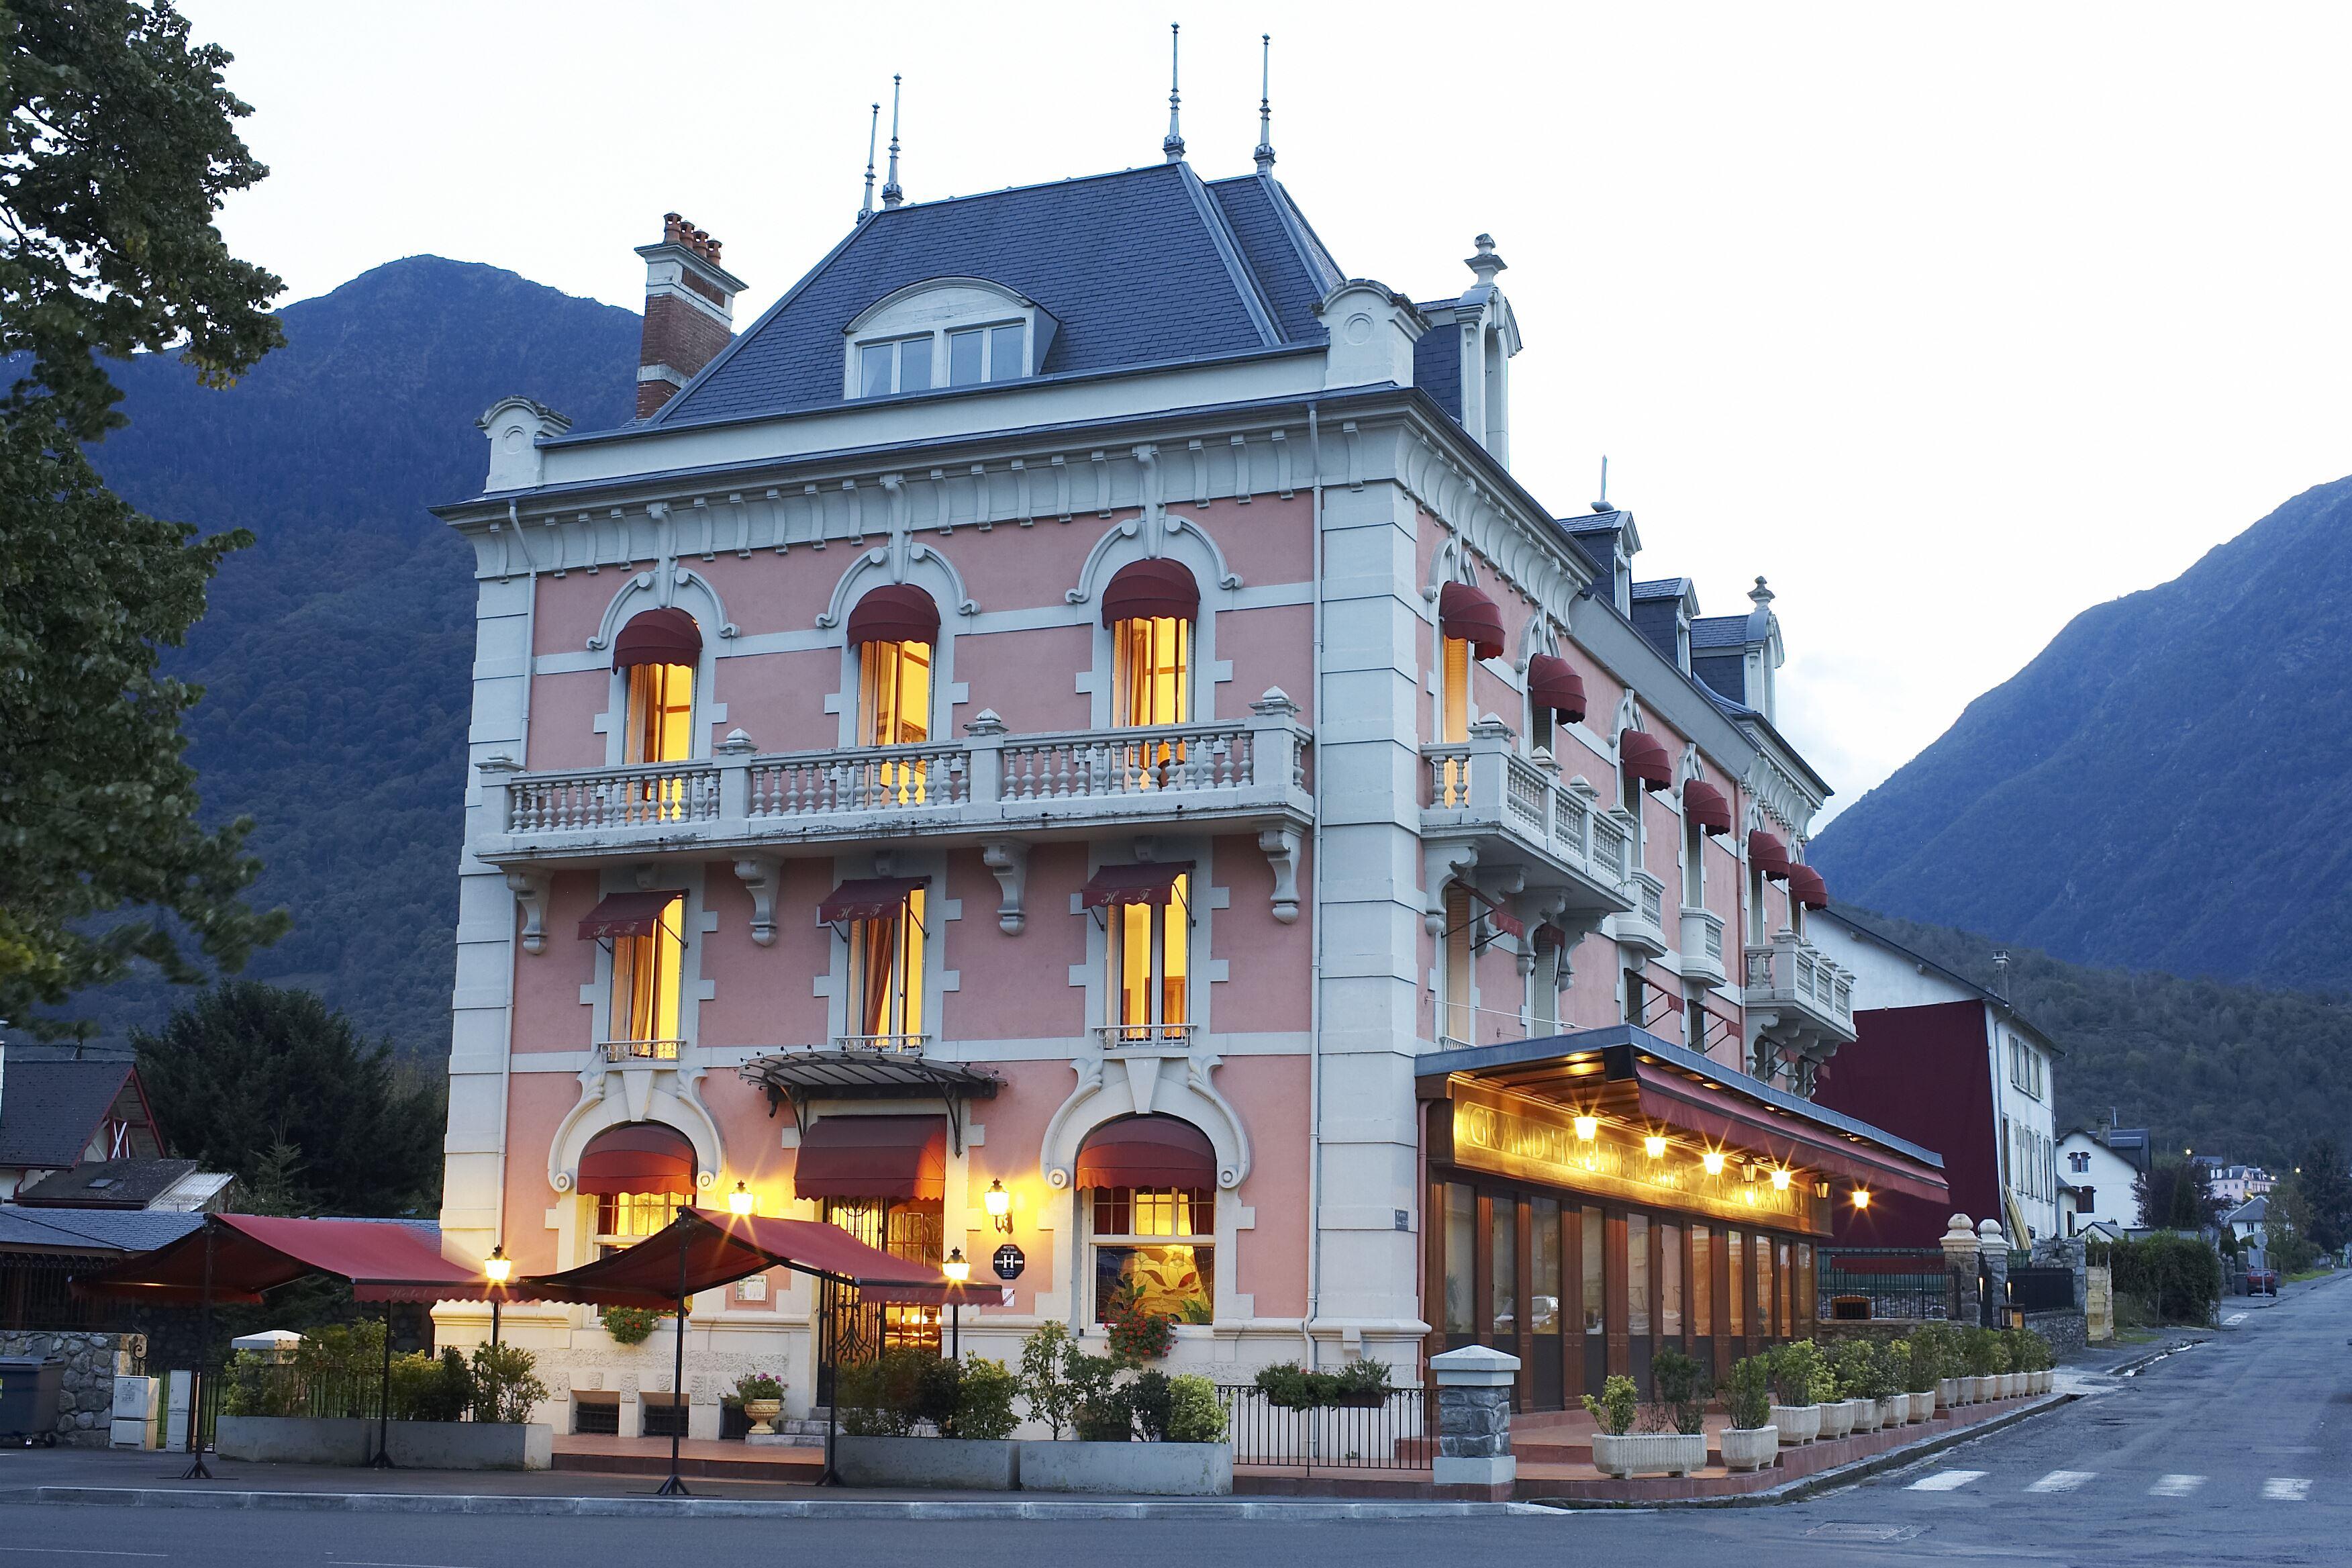 GRAND HOTEL DE FRANCE